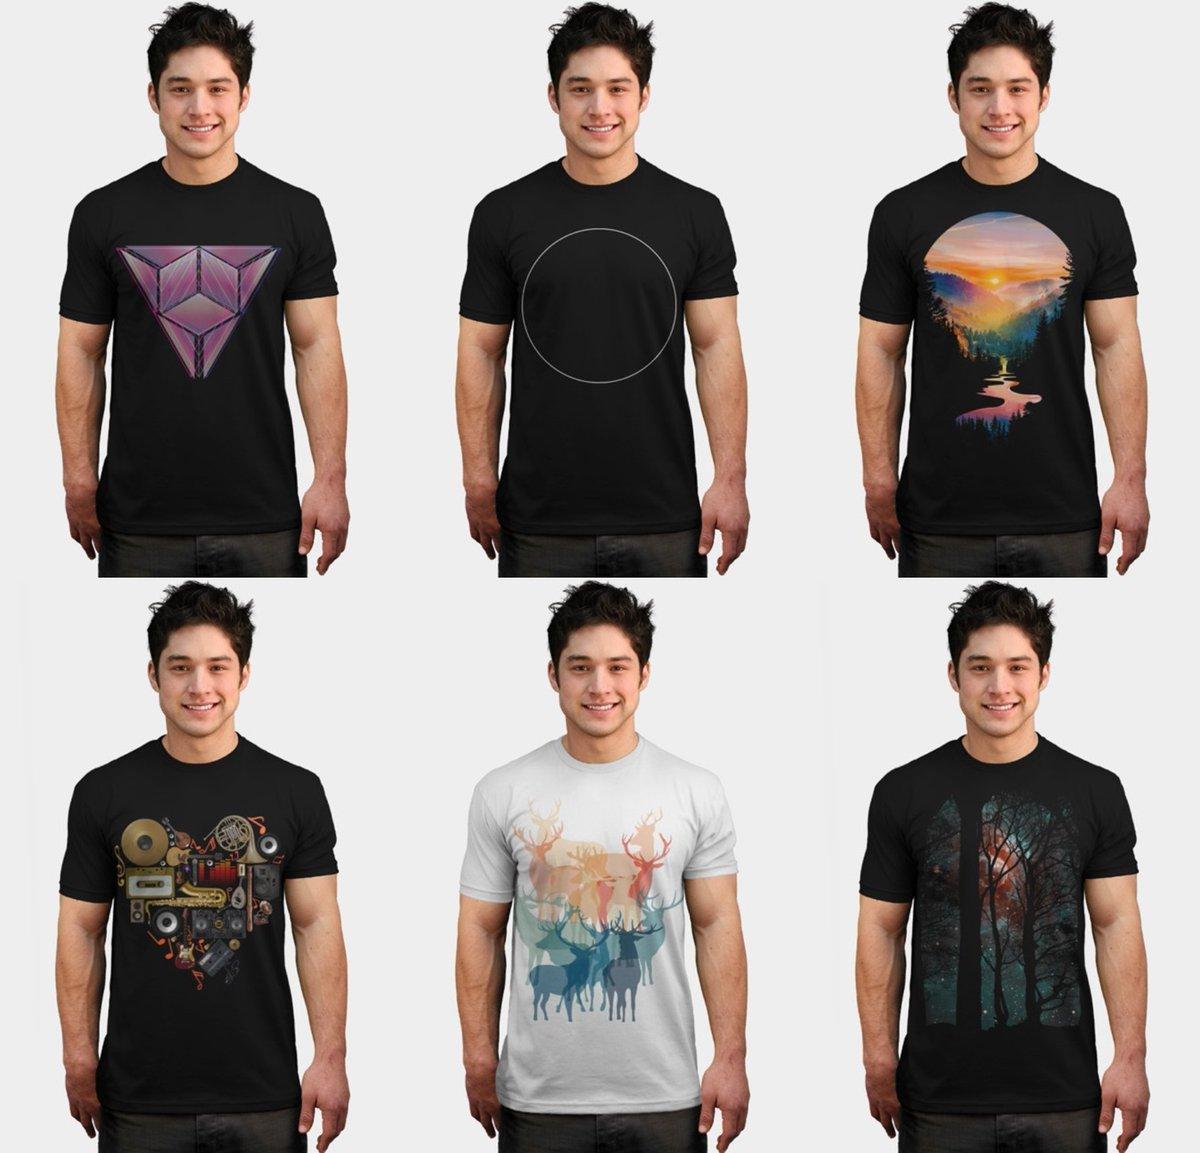 Shop now on @designbyhumans Collective Store  #clothing #tshirt #tshirts #design #geometry #abstract #illustration #men #women #boy #hexagon #triangles #shapes #animals #nature #gaming #mug #phonecase #sweater #tanktop #sticker #sweatshirt #artprint #colors